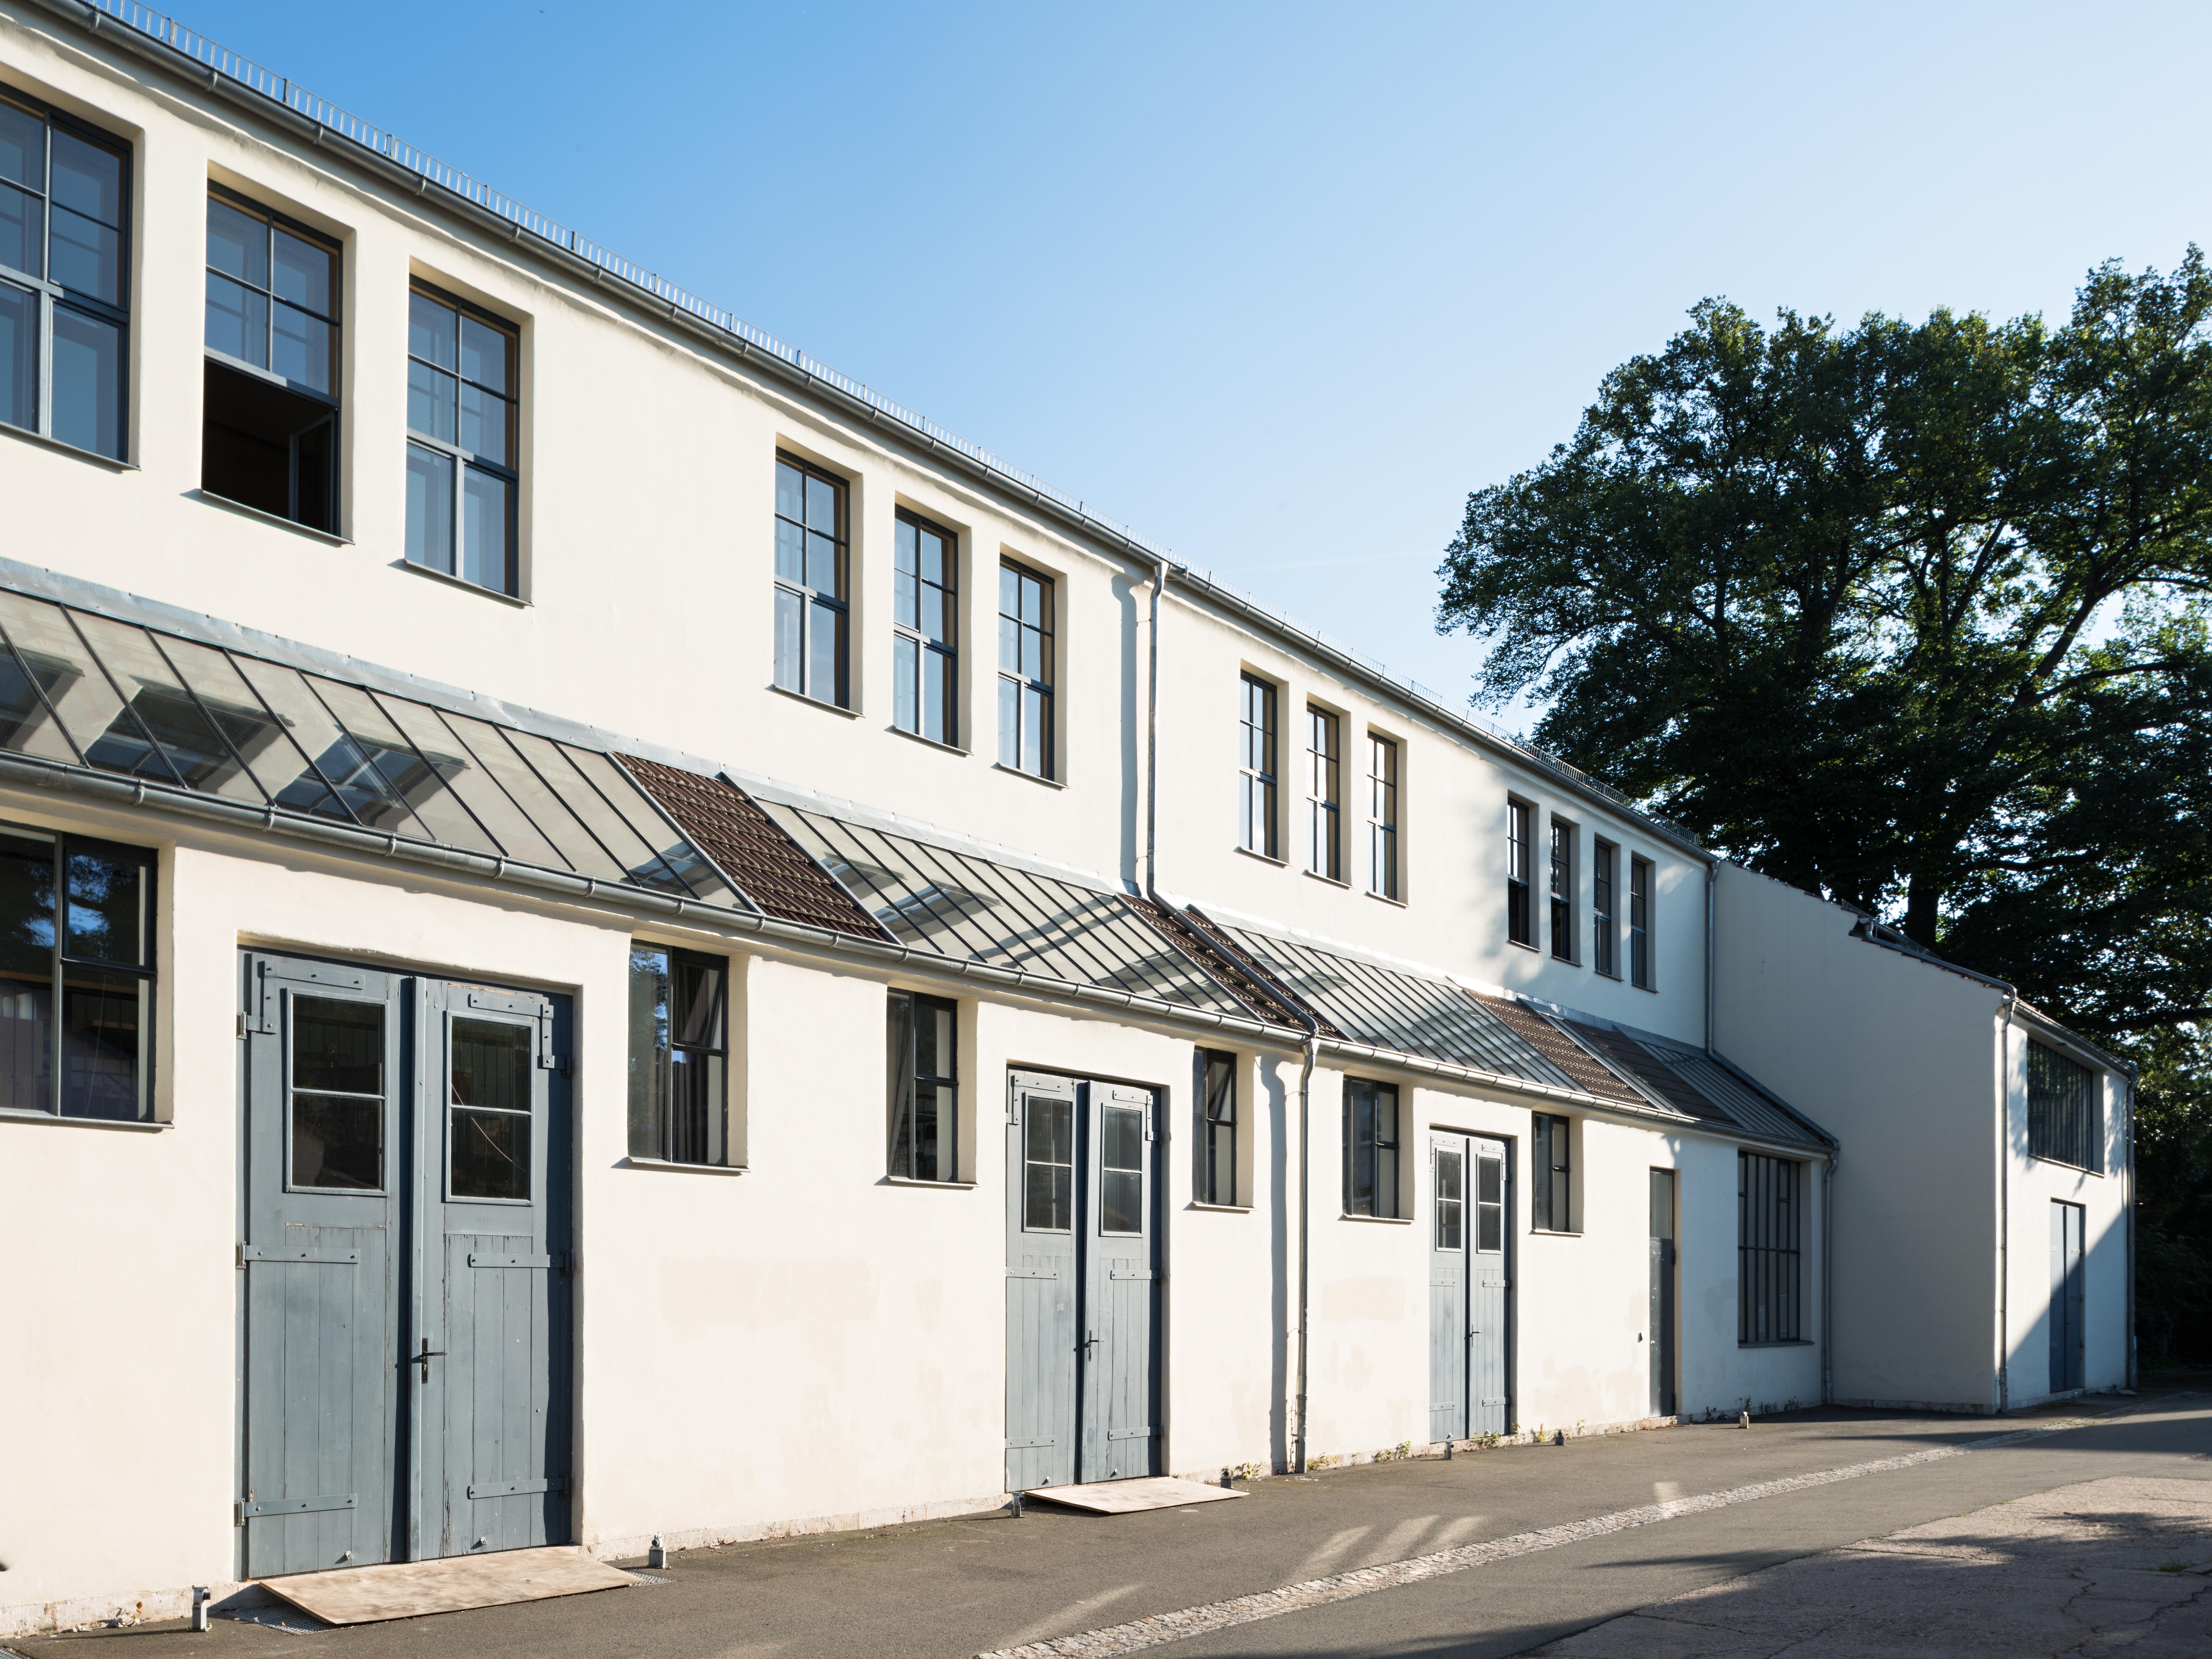 Bauhaus Universitat Weimar Media Services For The Bauhaus